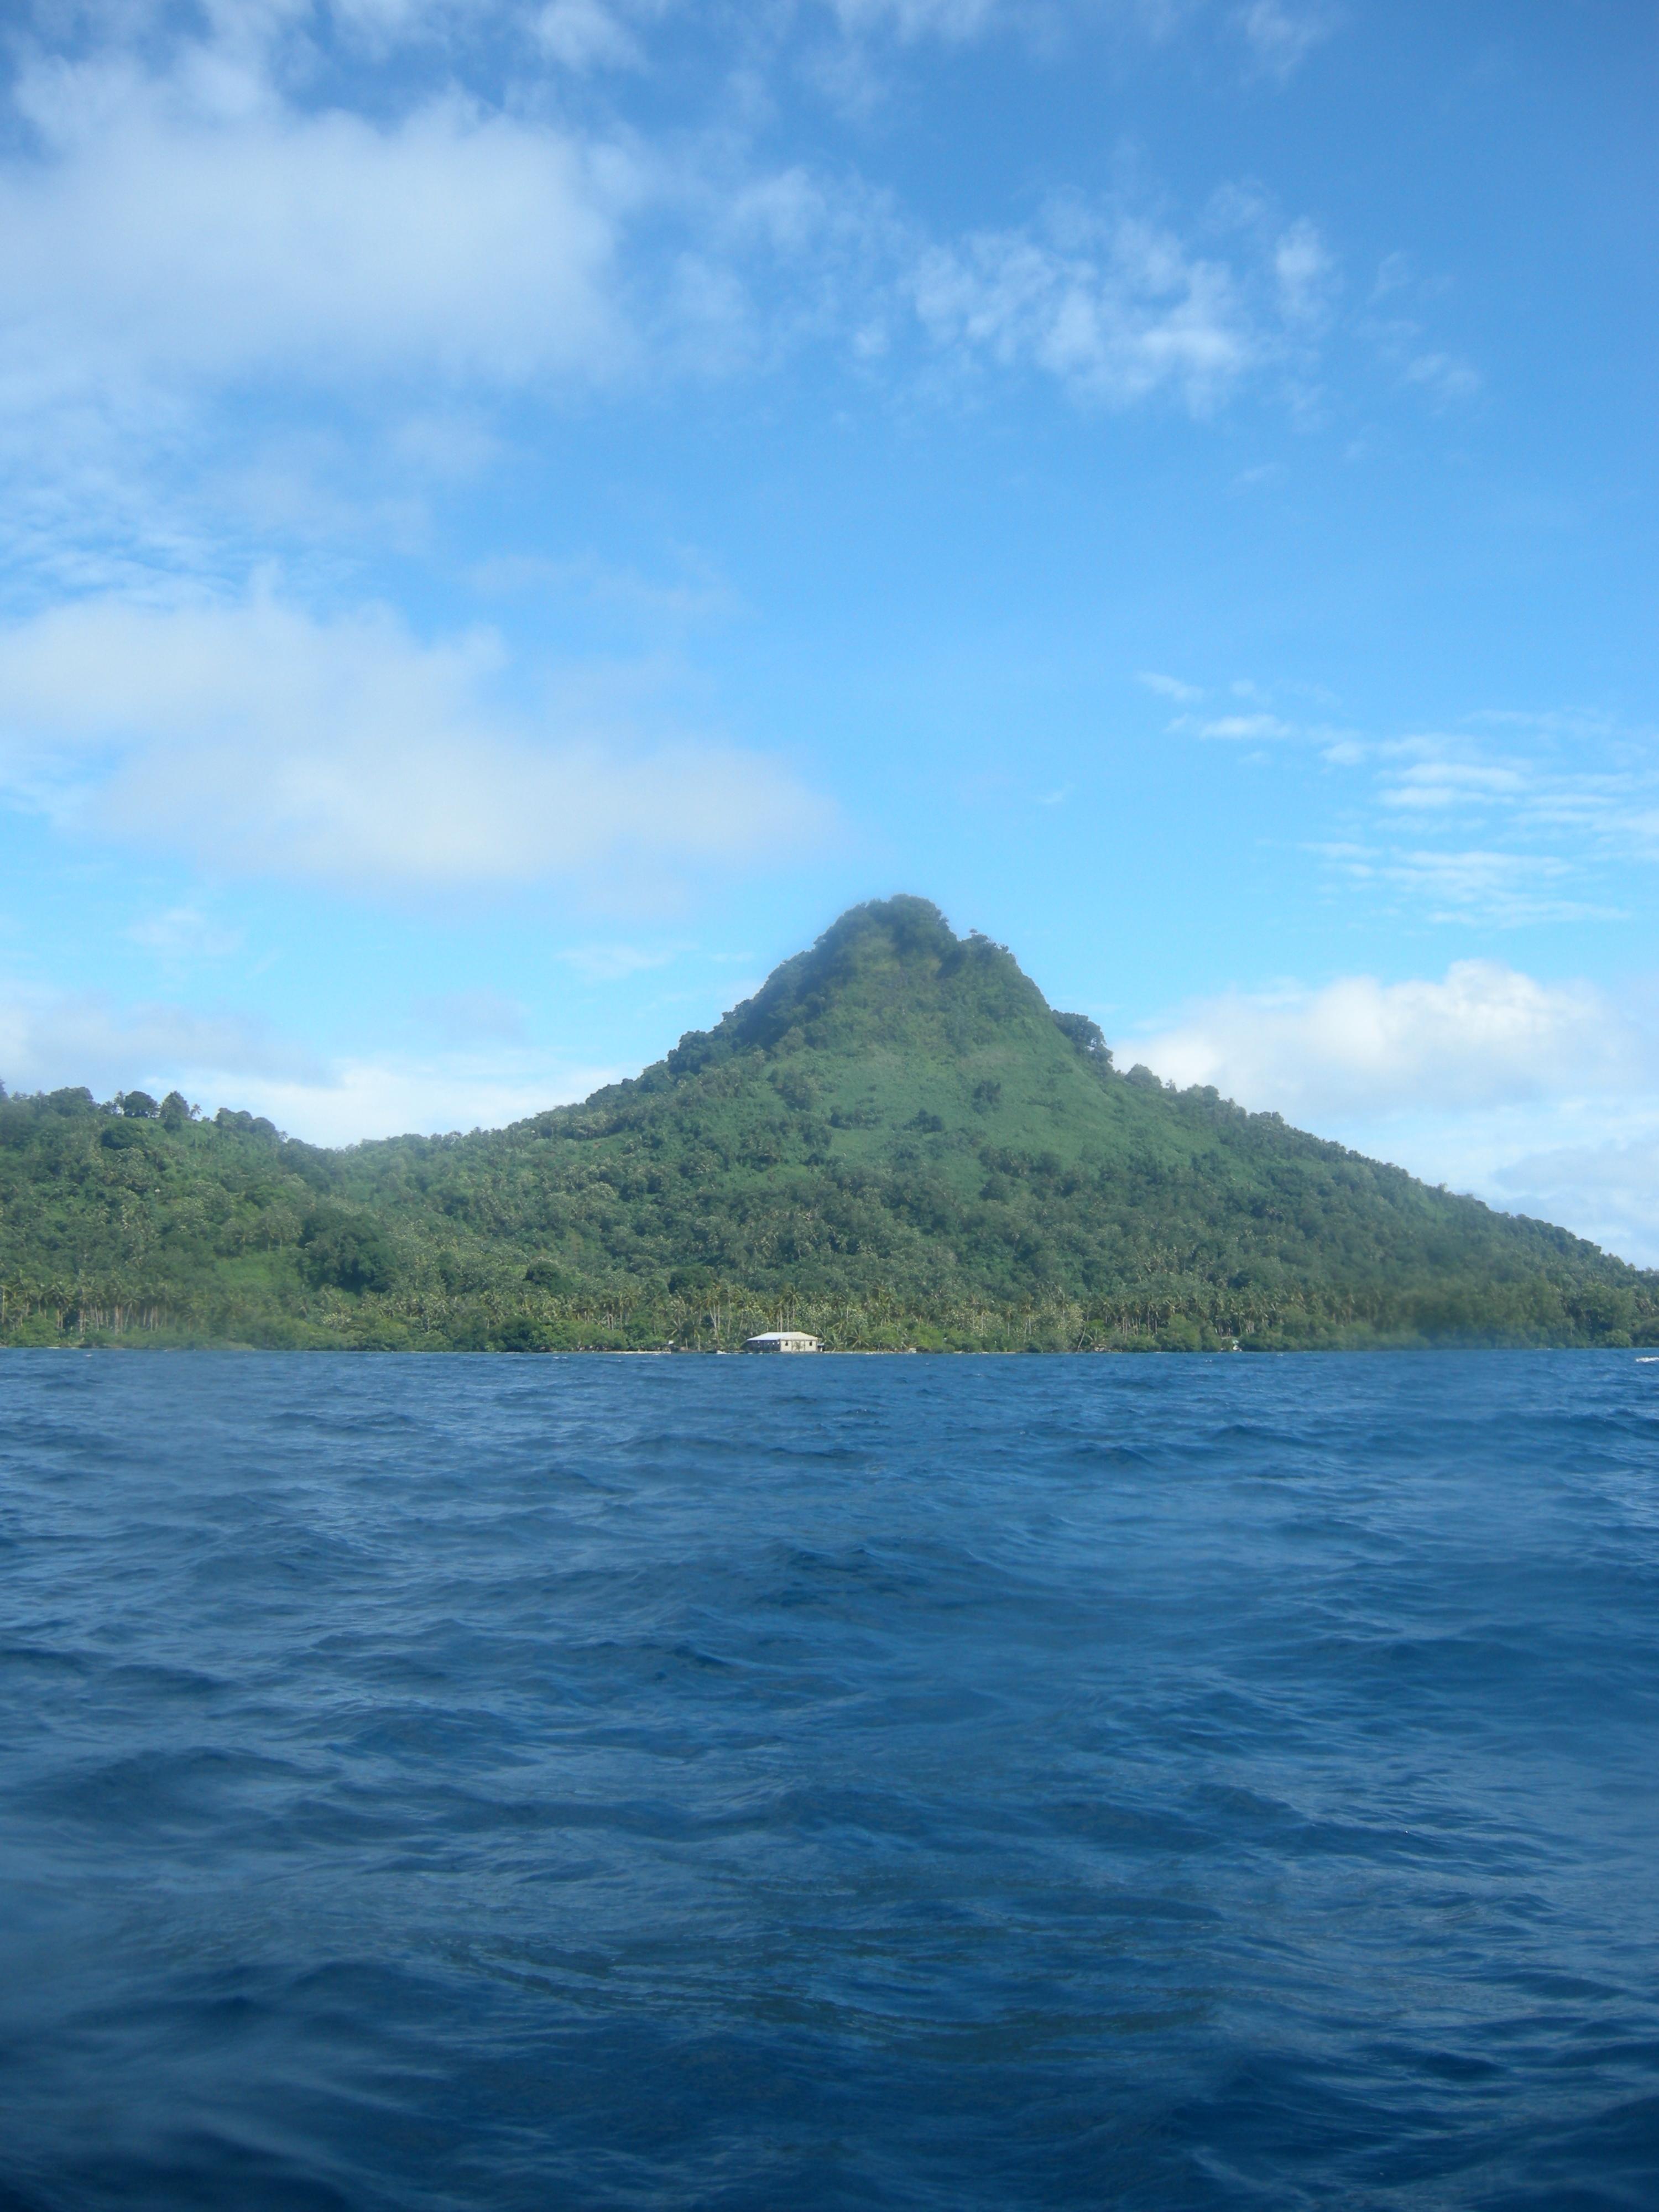 Http Commons Wikimedia Org Wiki File Dublon Island Chuuk Micronesia Jpg